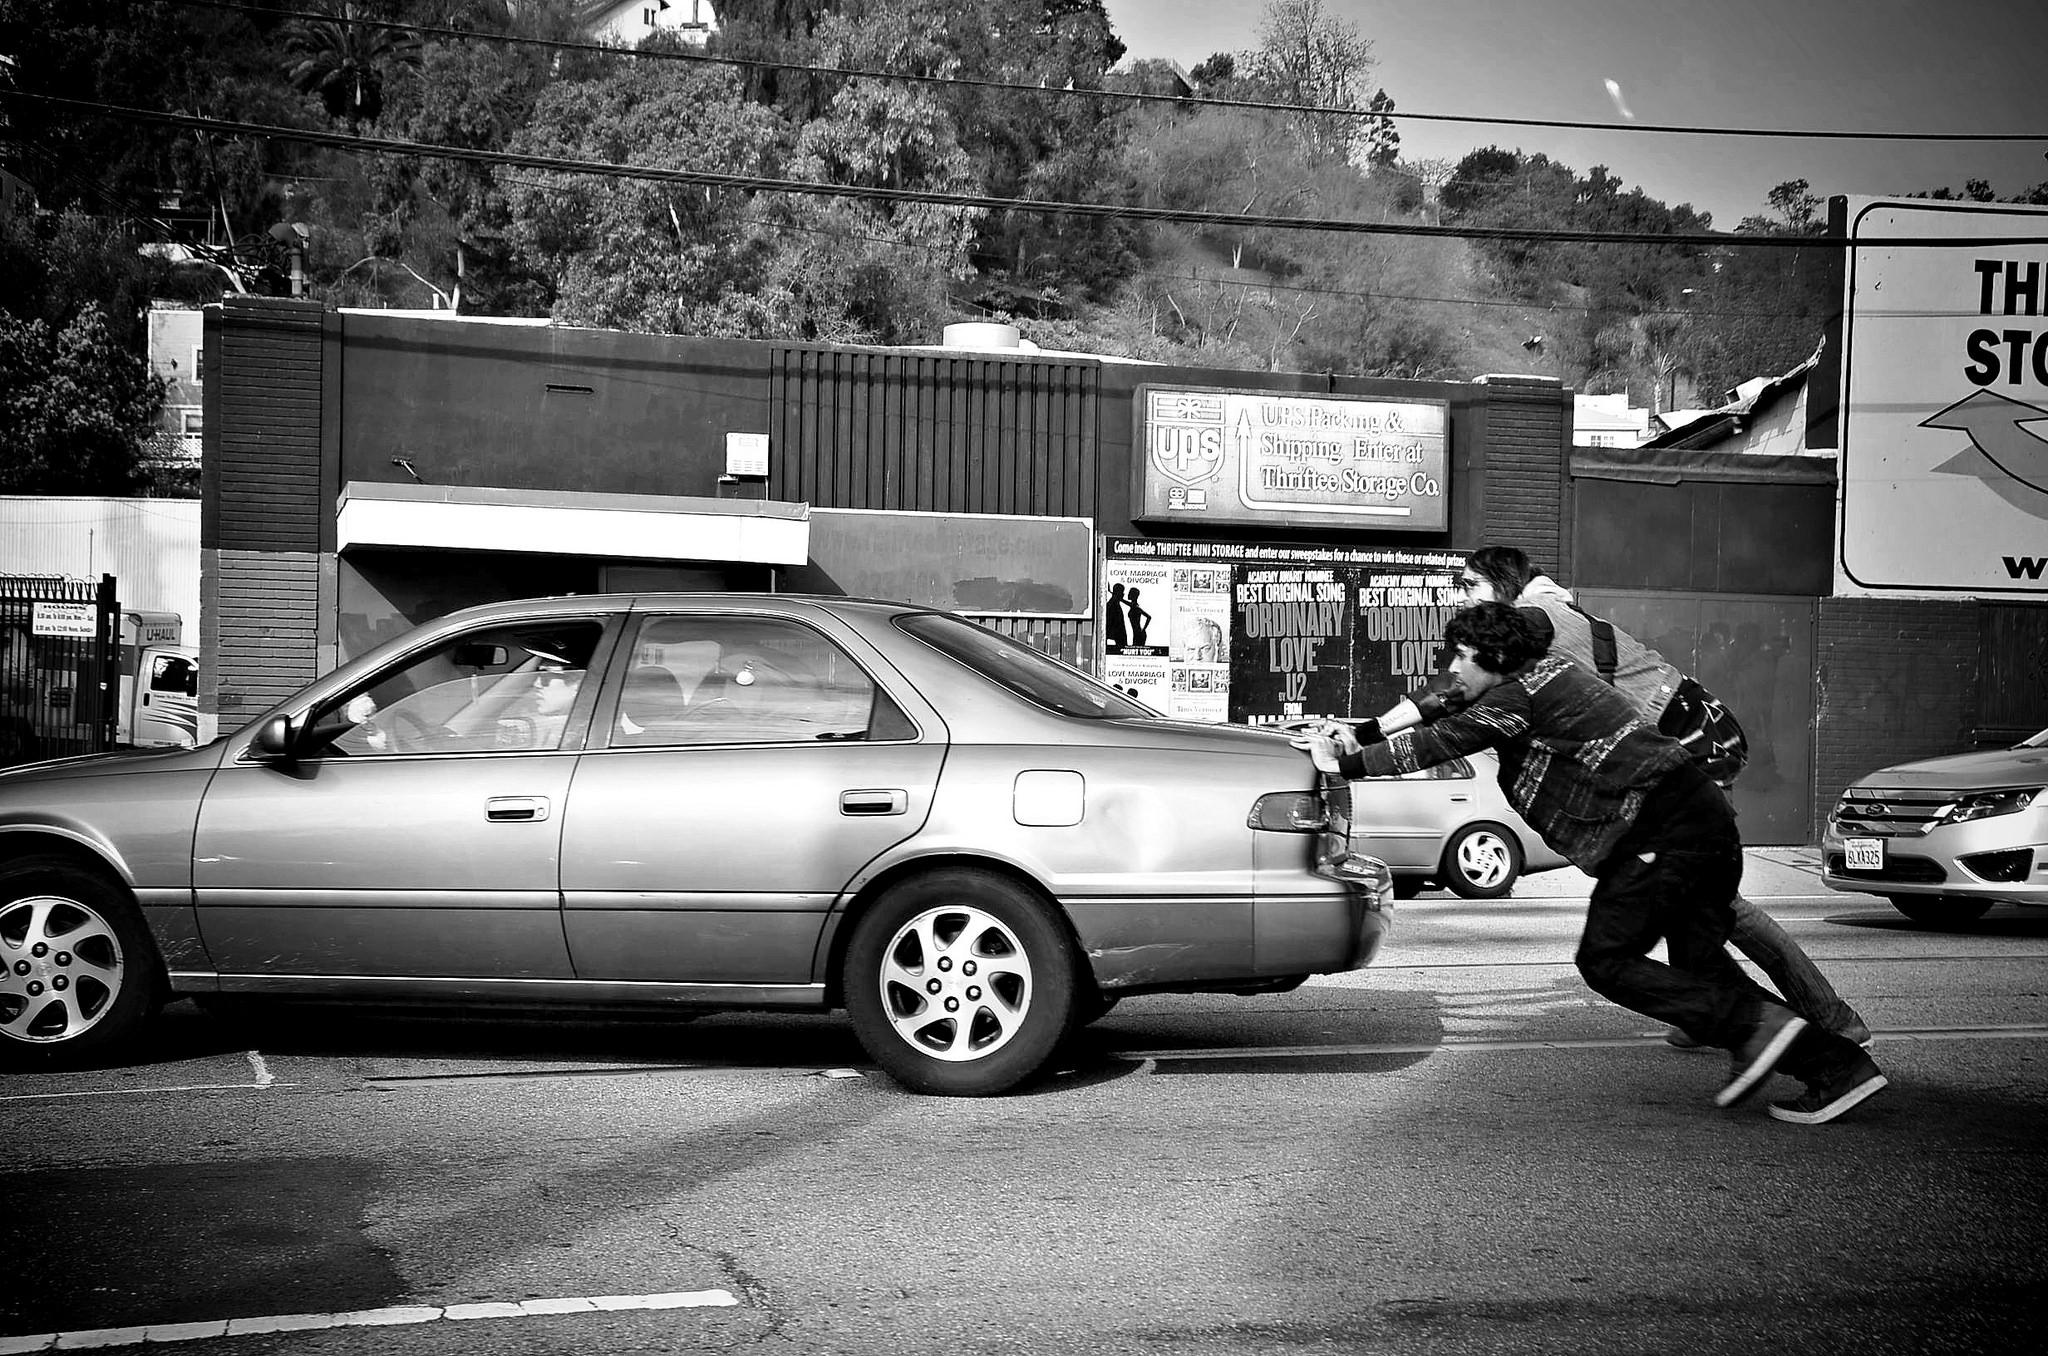 Glendale Blvd., Echo Park, Los Angeles